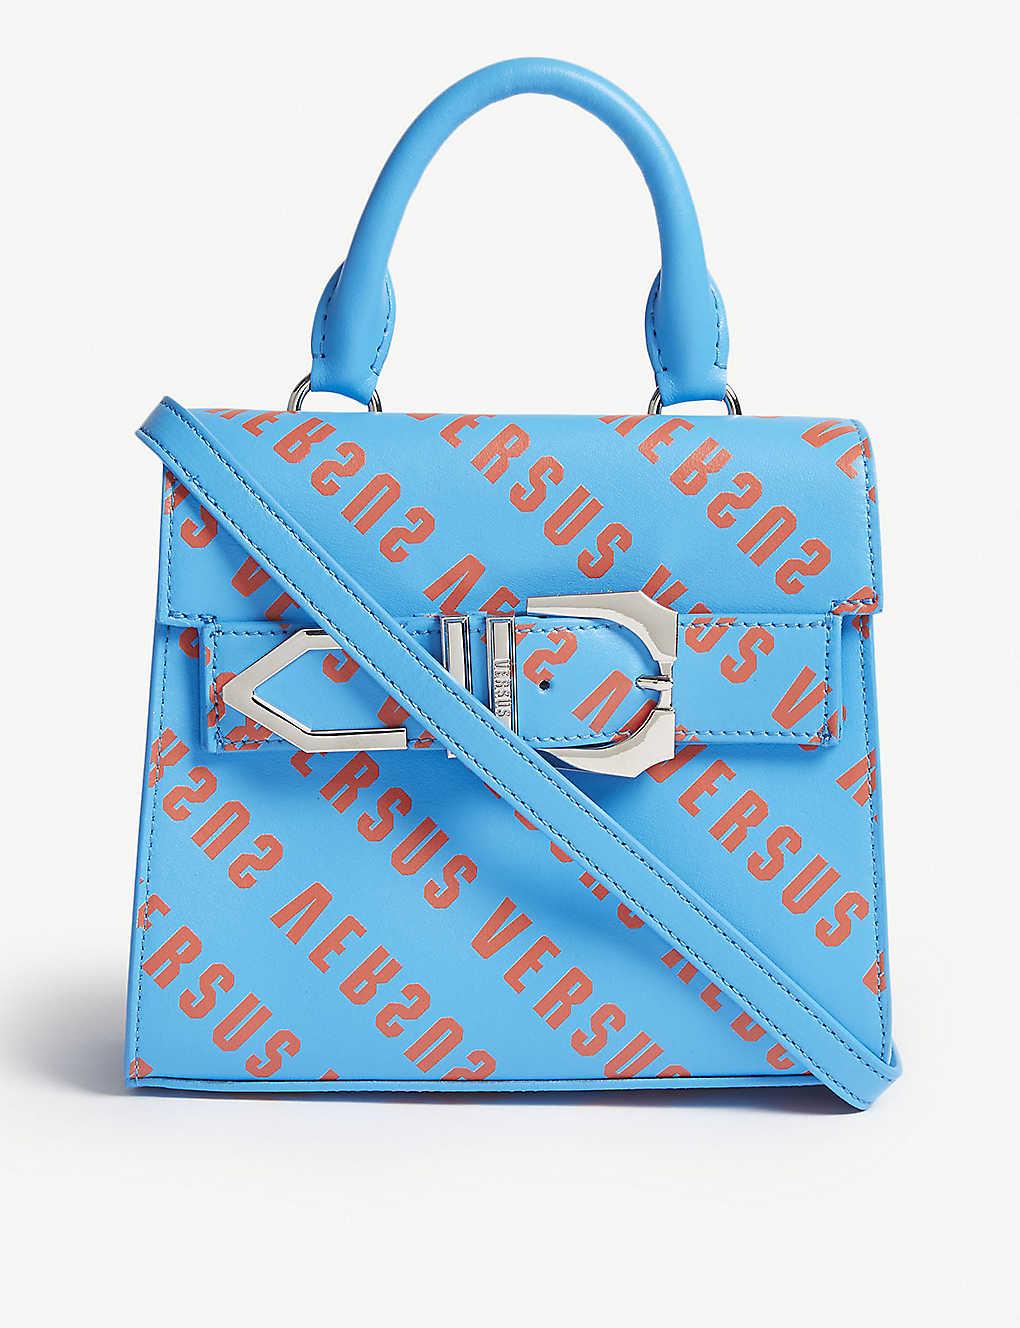 3fc289b9ded7 VERSUS VERSACE - Iconic Buckle logo-print leather bag